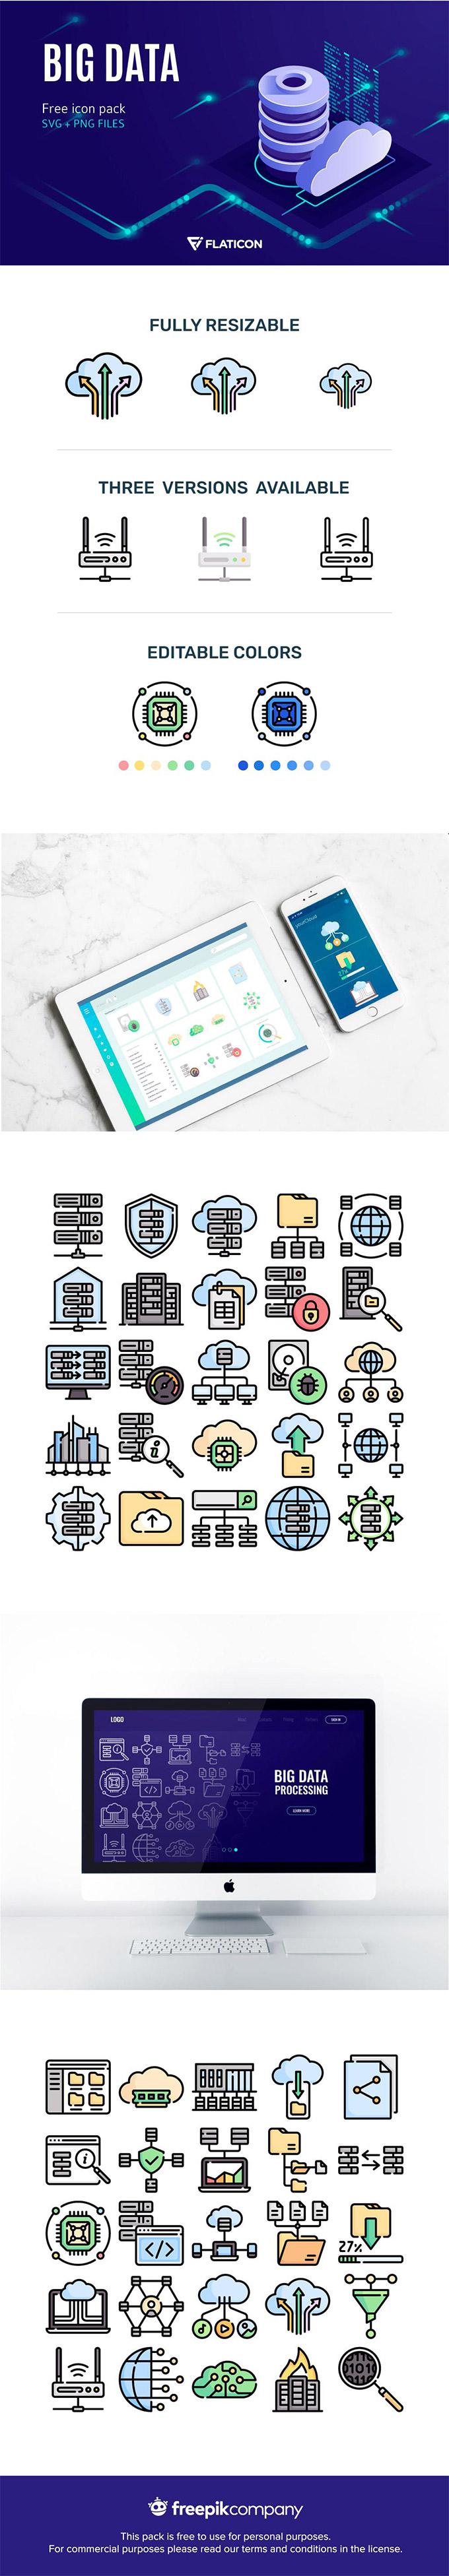 Big Data Icon Set